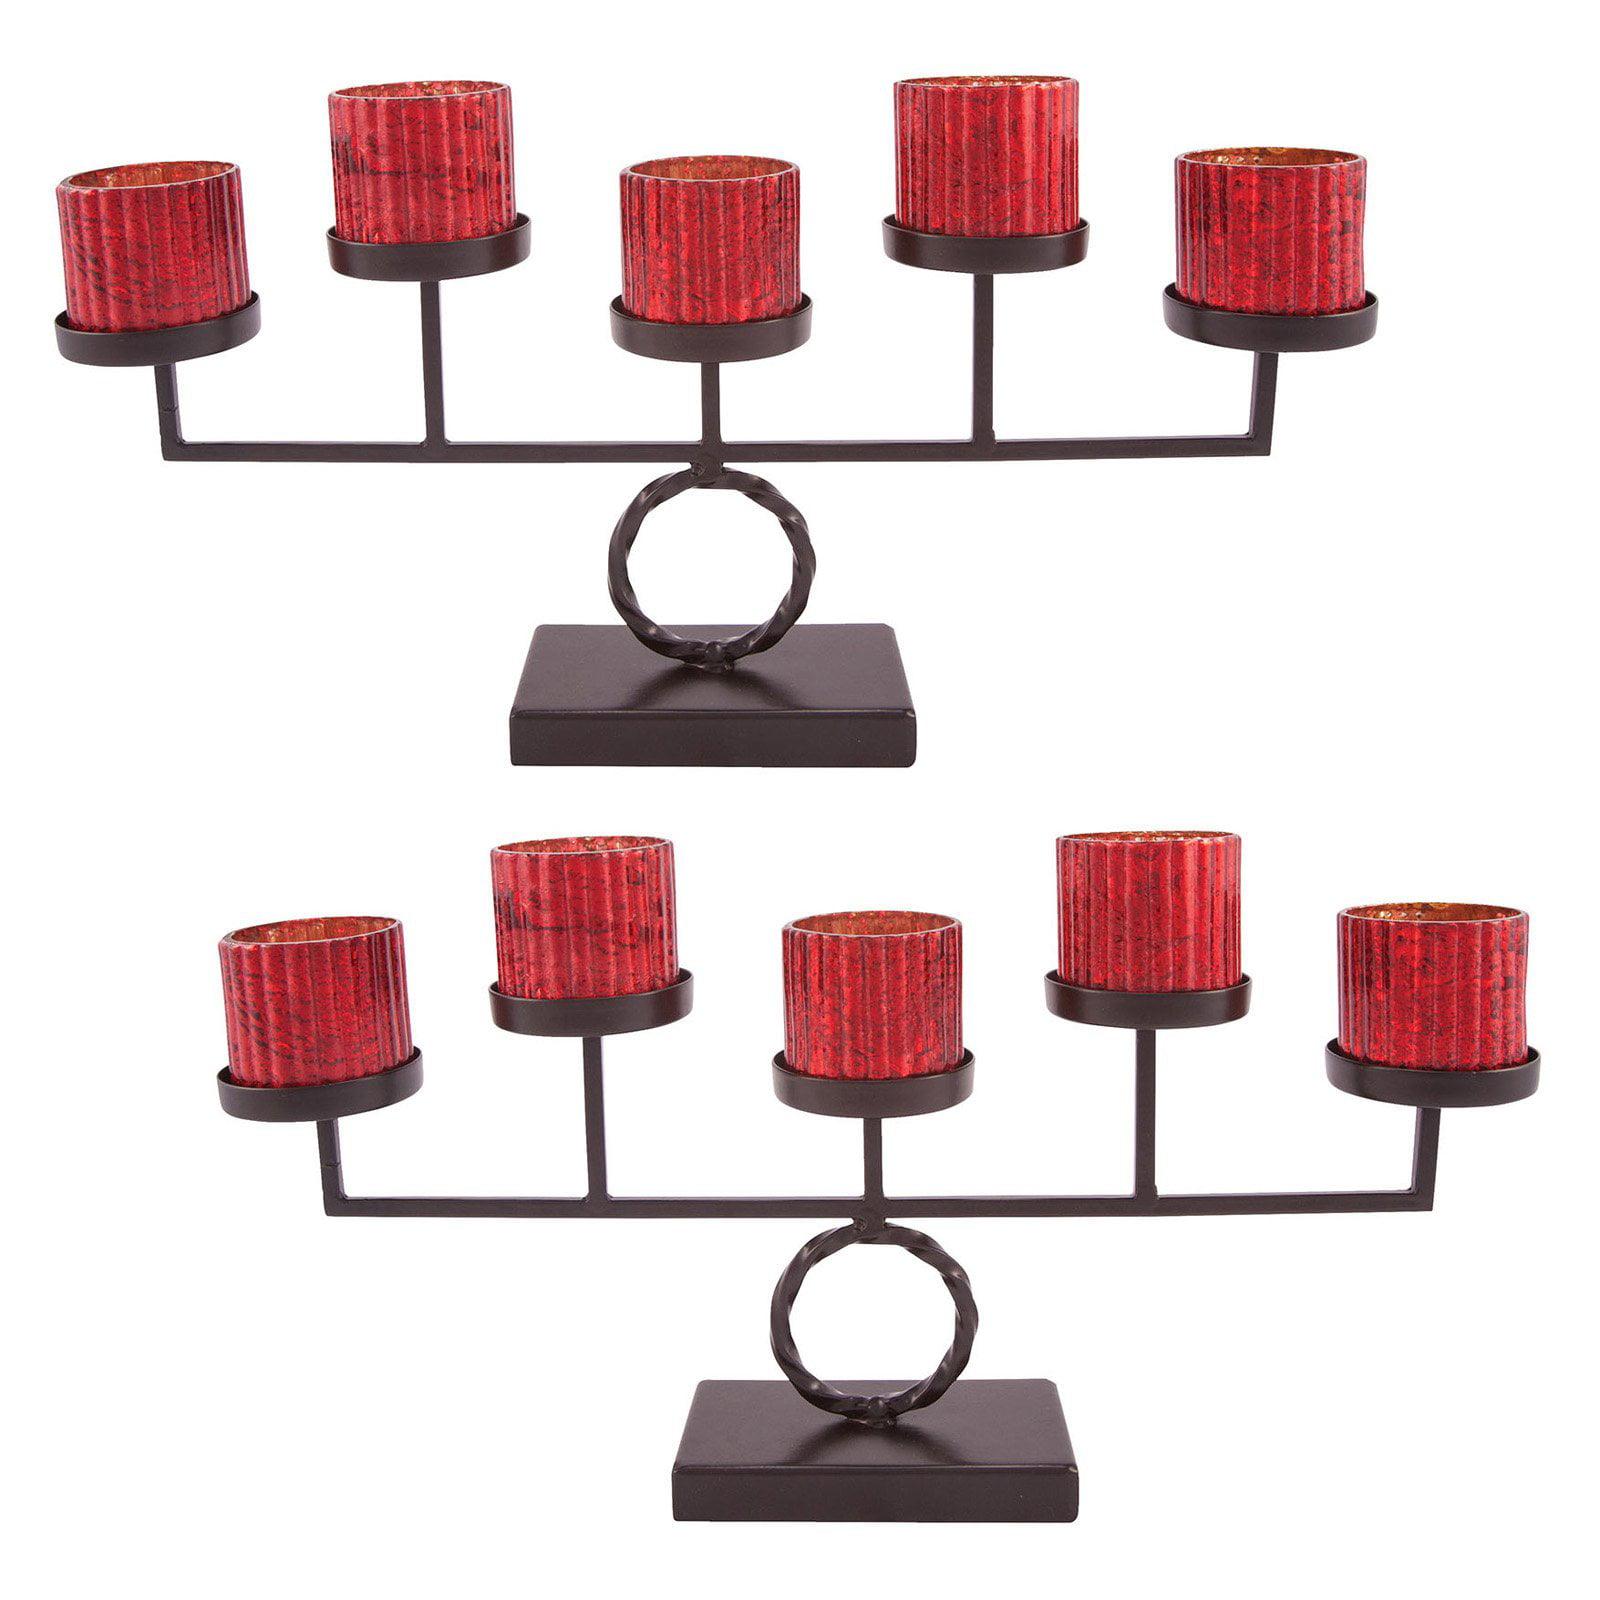 ELK Lighting Holiday Votive Centerpieces Set of 2 by Pomeroy